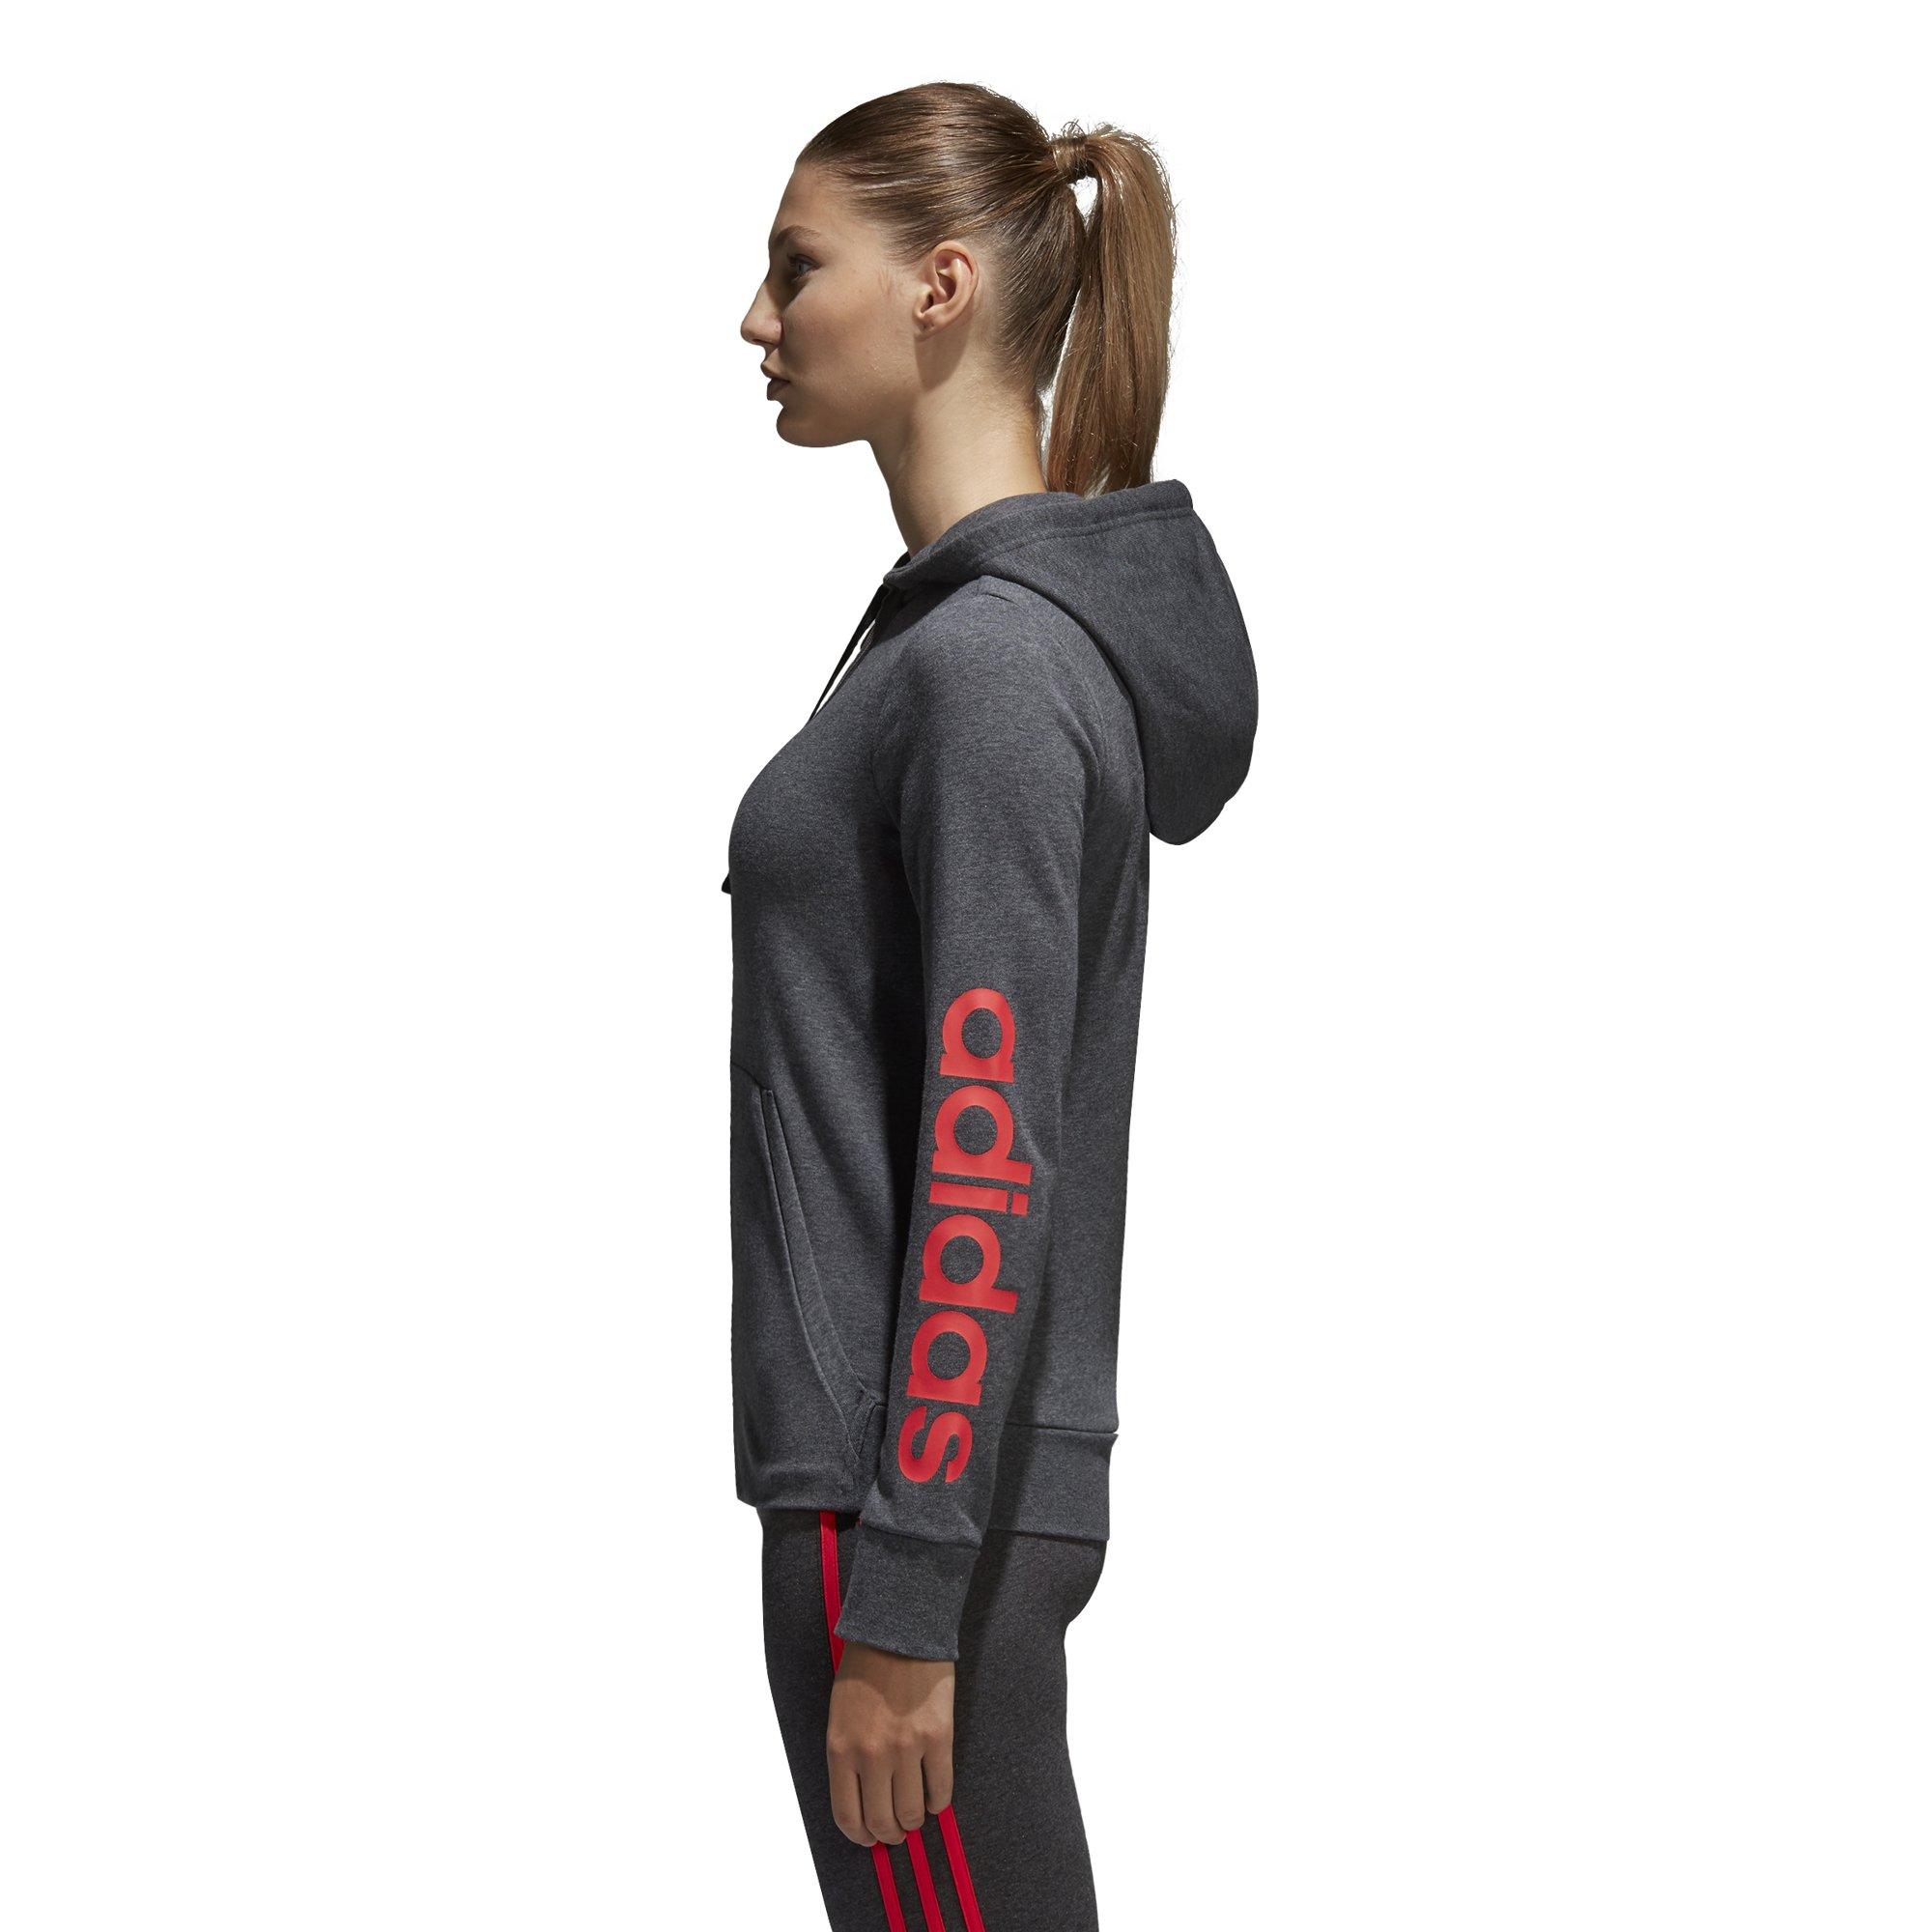 adidas Women's Essentials Linear Full Zip Fleece Hoodie, Dark Grey Heather/Real Coral, X-Small by adidas (Image #3)